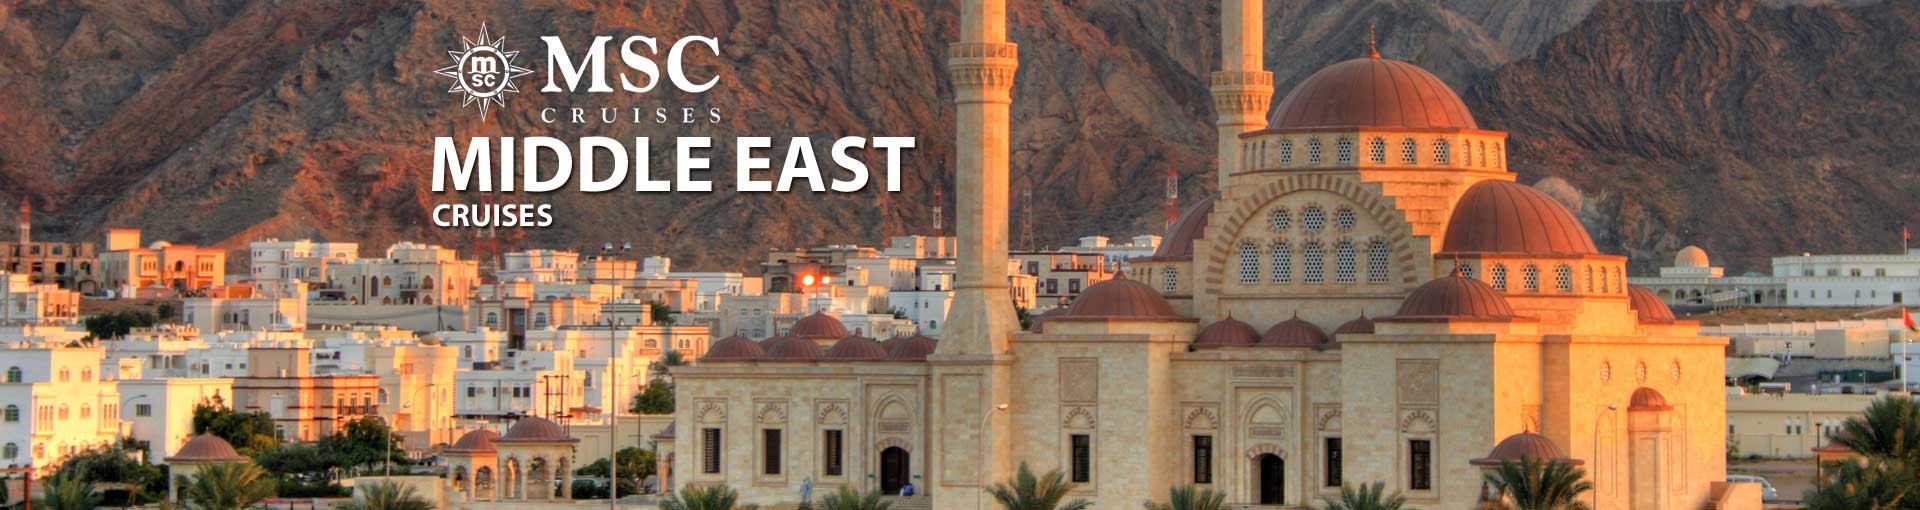 Msc Cruises Asia & Middle East Cruises